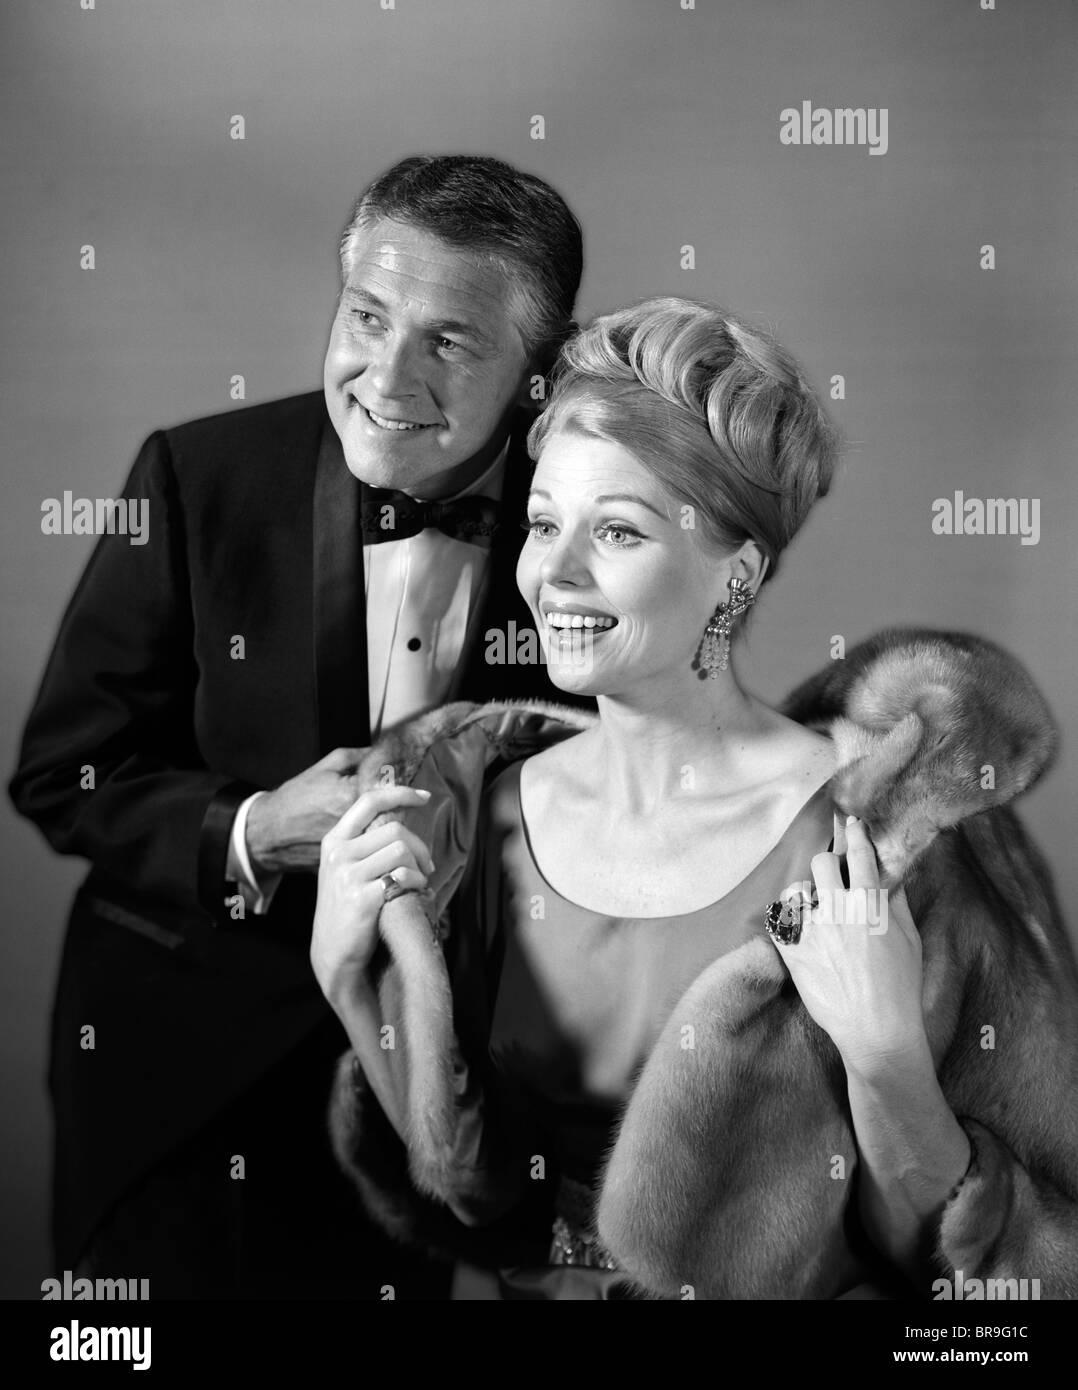 4c50aa3c4f 1960s 1970s COUPLE IN EVENING WEAR MAN IN TUXEDO WOMAN IN FUR COAT - Stock  Image